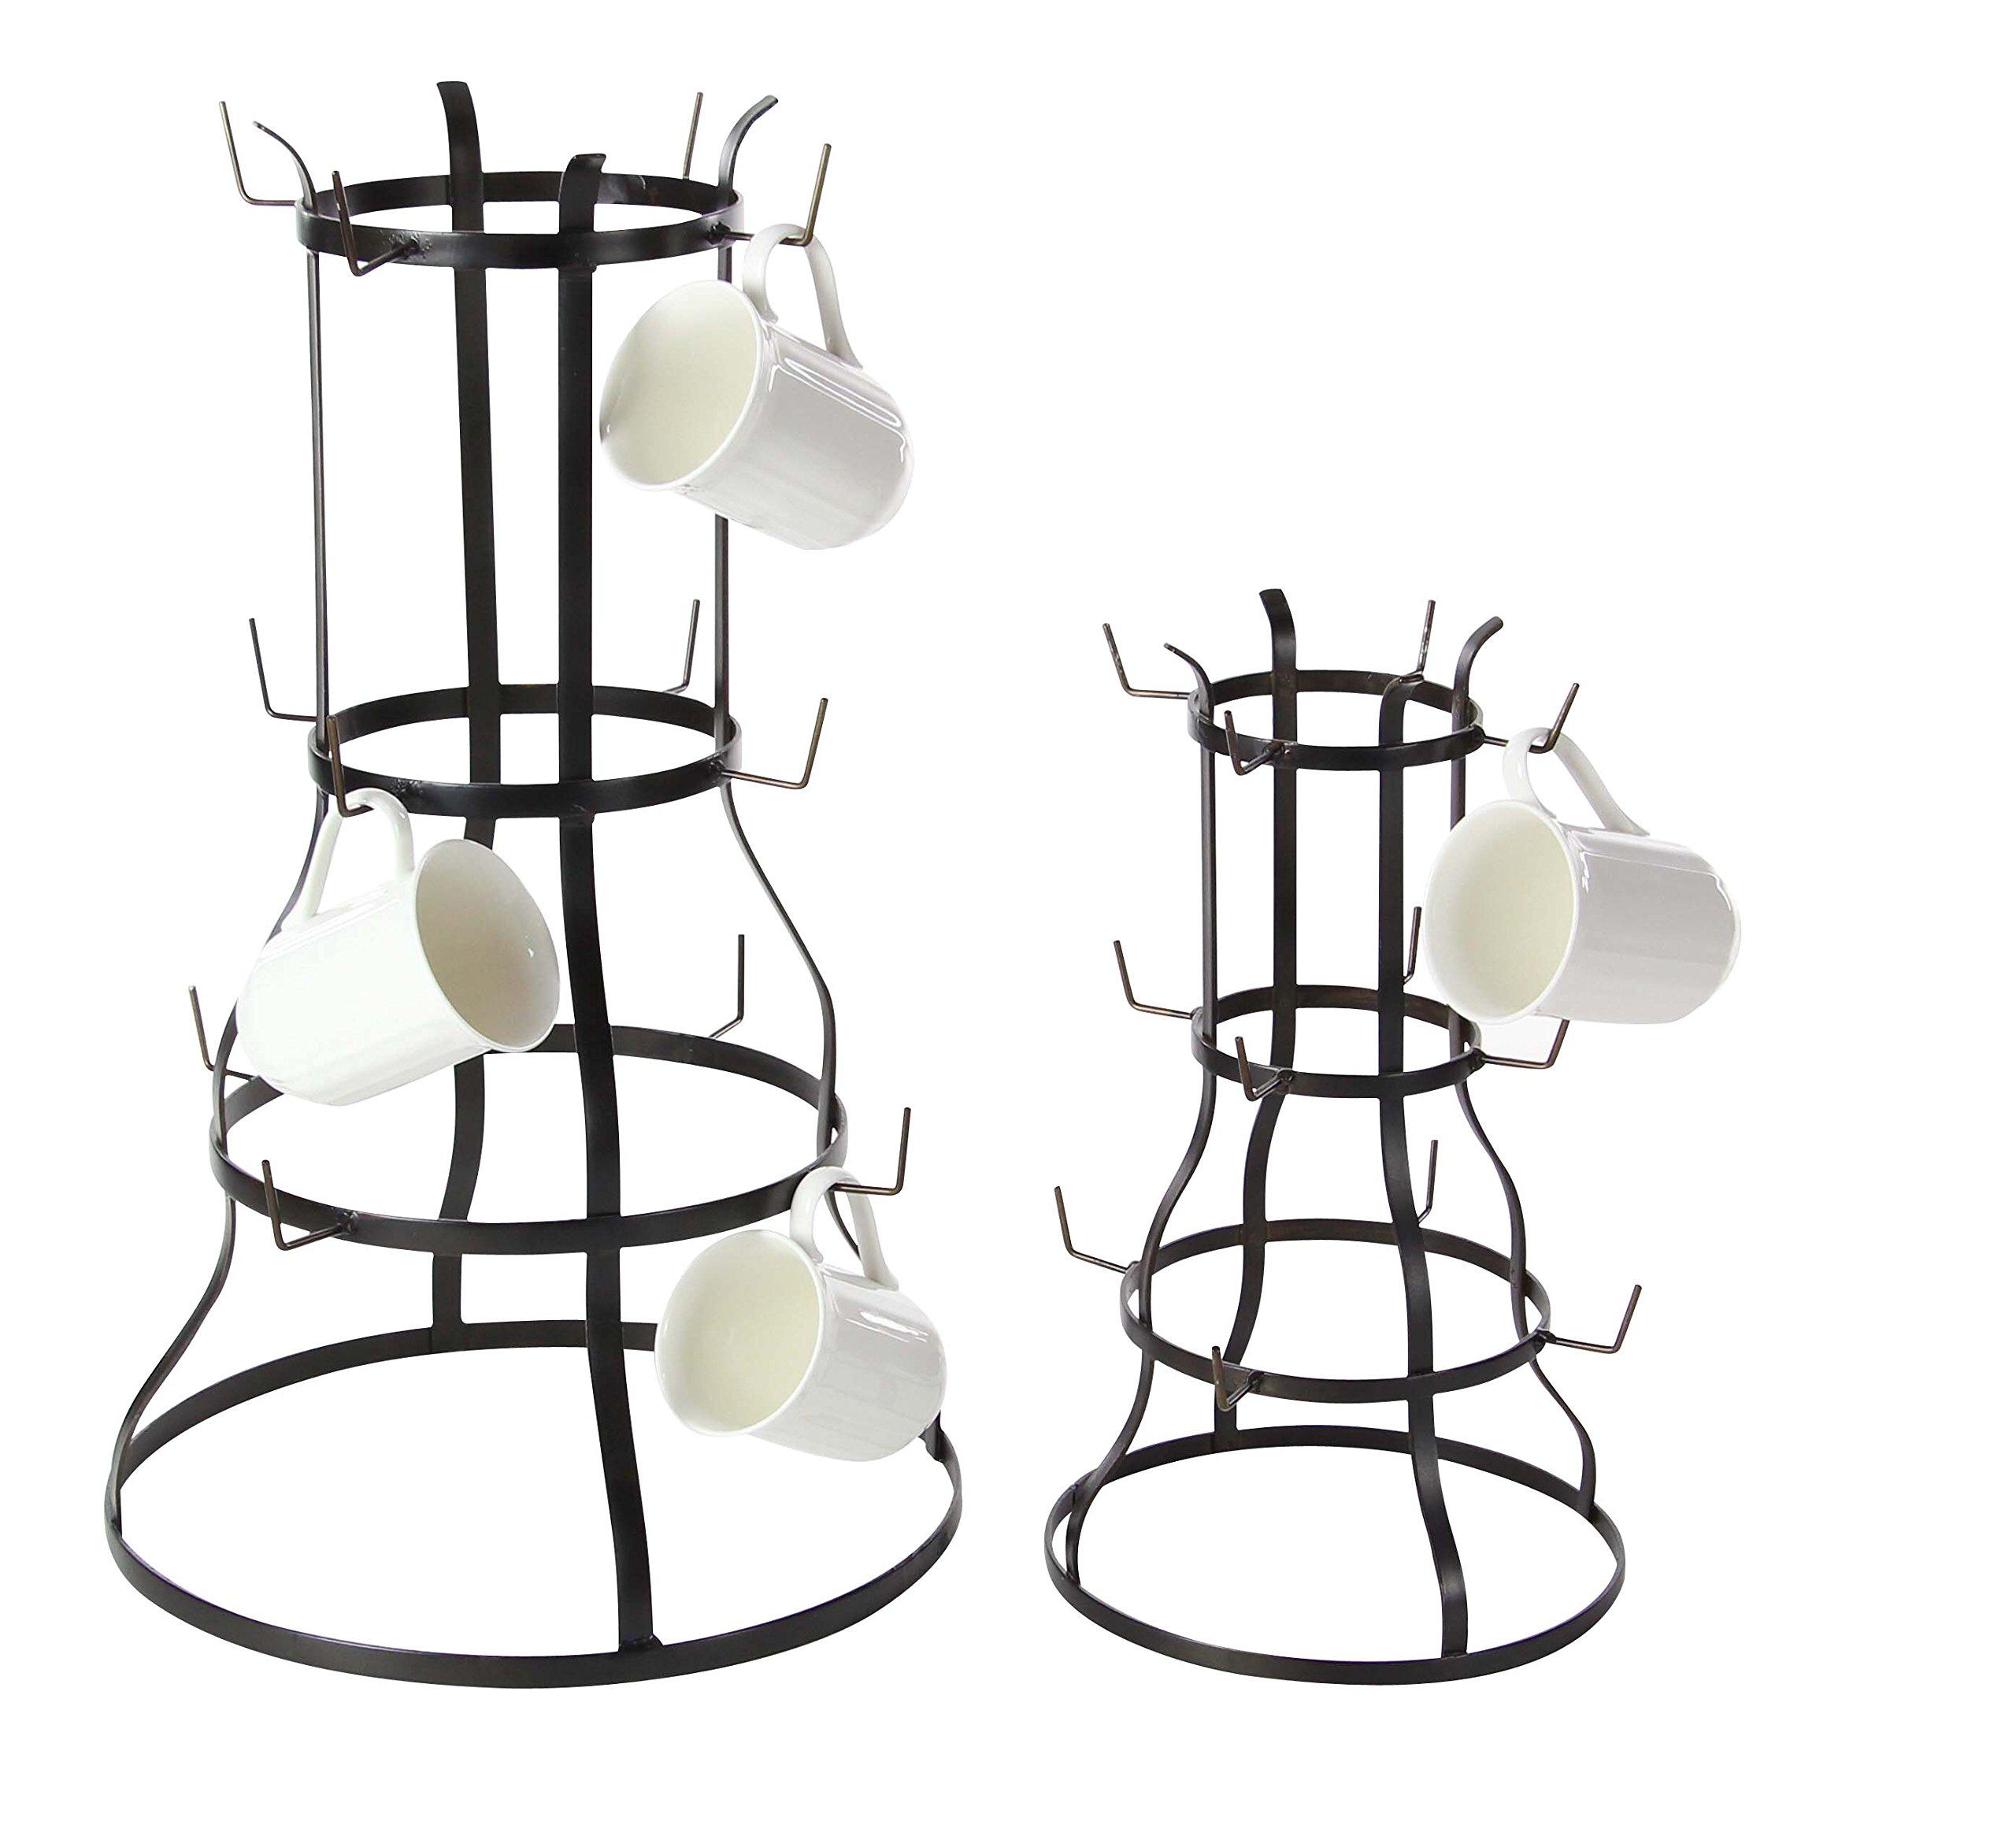 Deco 79 70555 Iron Bell-Shaped Mug Racks (Set of 2), Black